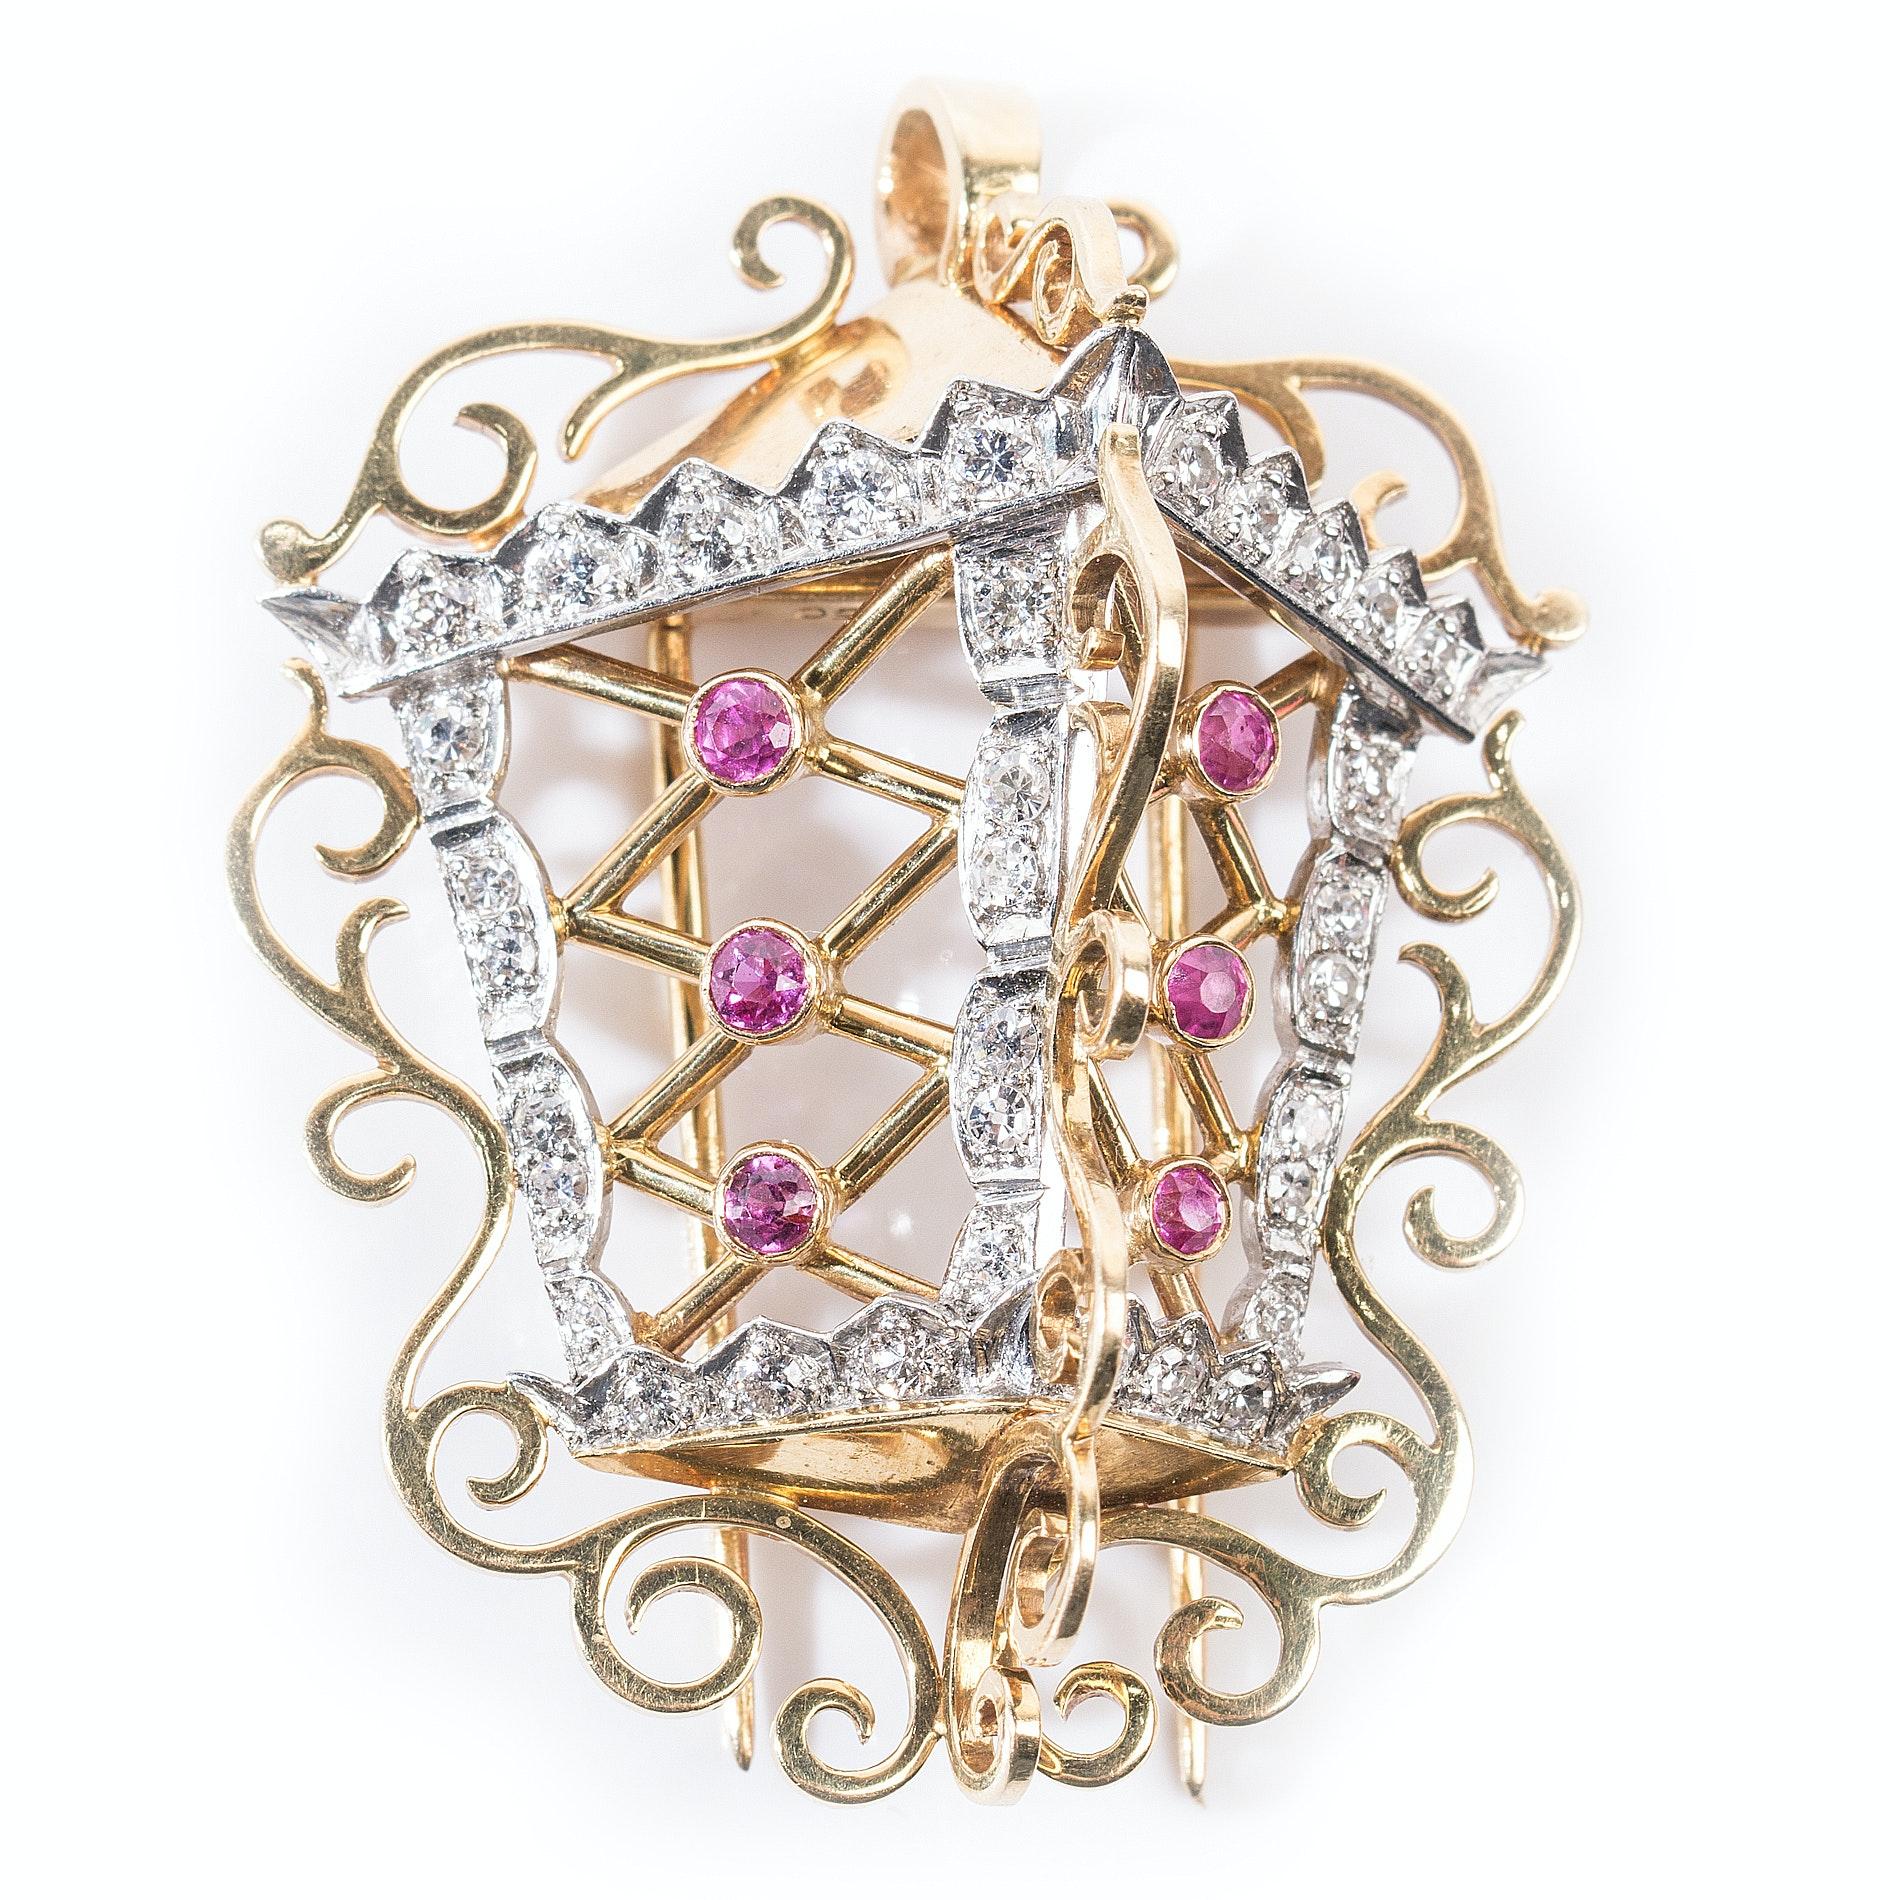 18K Yellow Gold and Platinum Diamond and Ruby Lantern Pendant Brooch